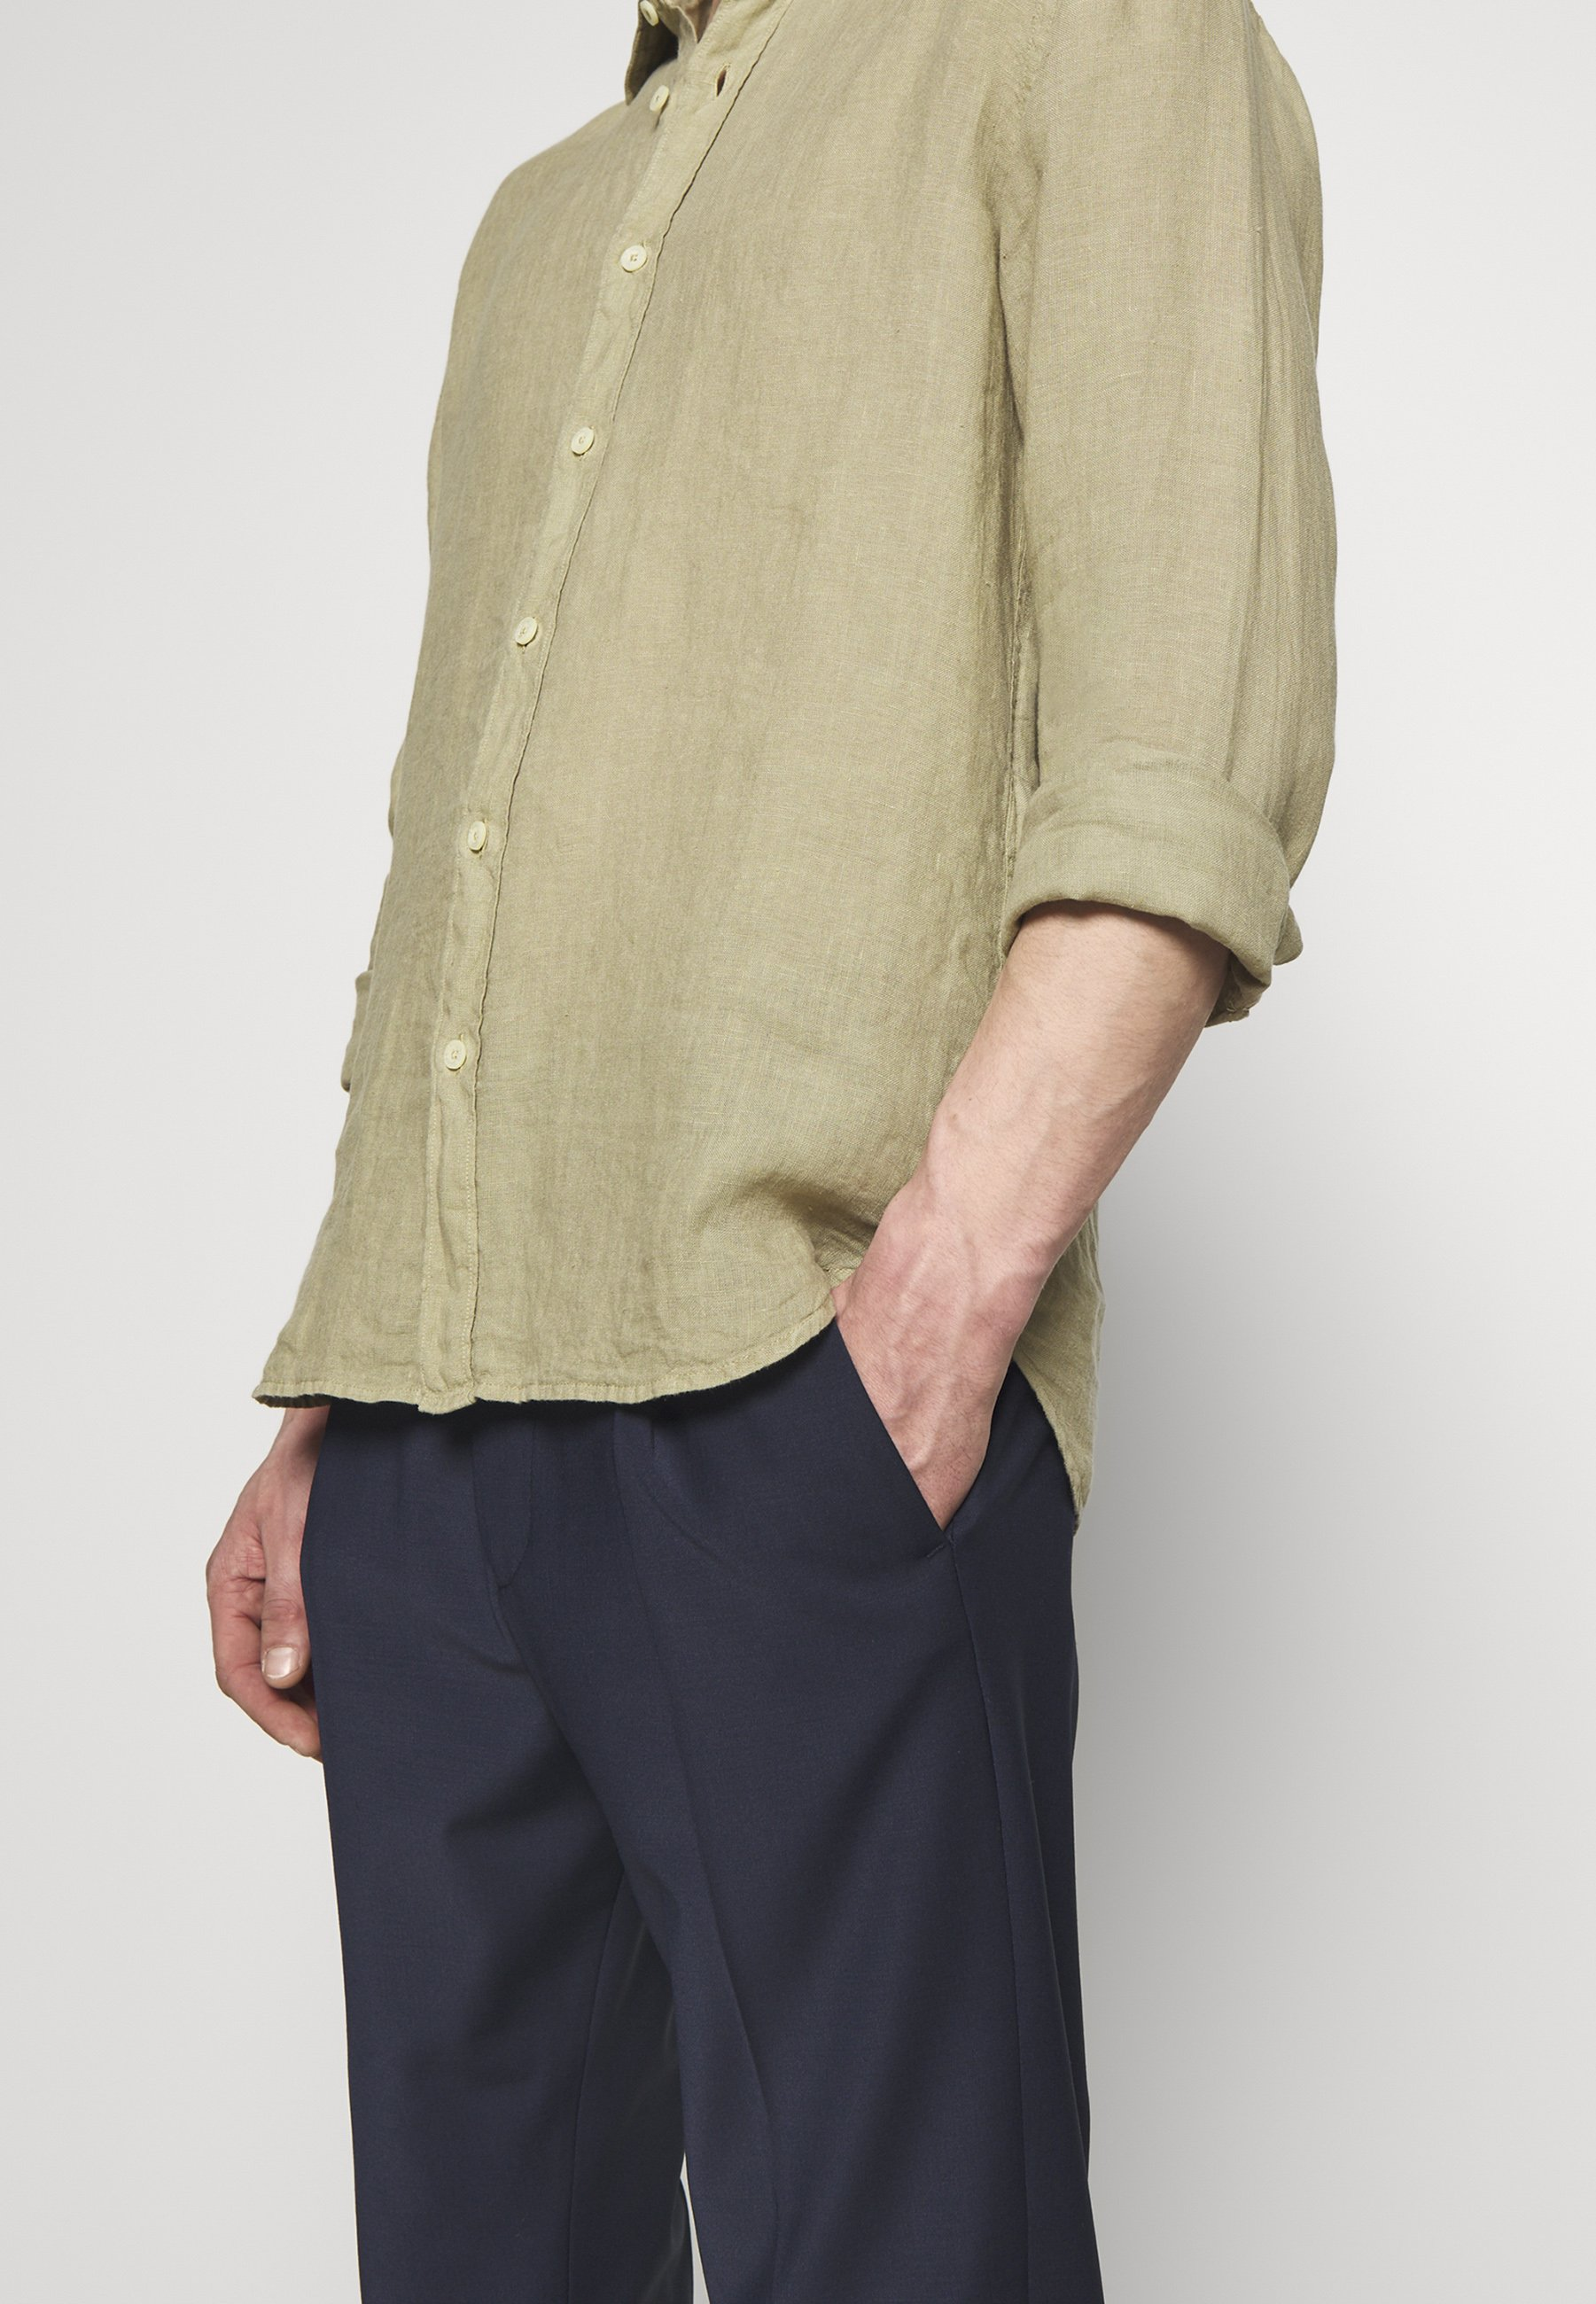 120% Lino Overhemd - Olive bmCiMm9